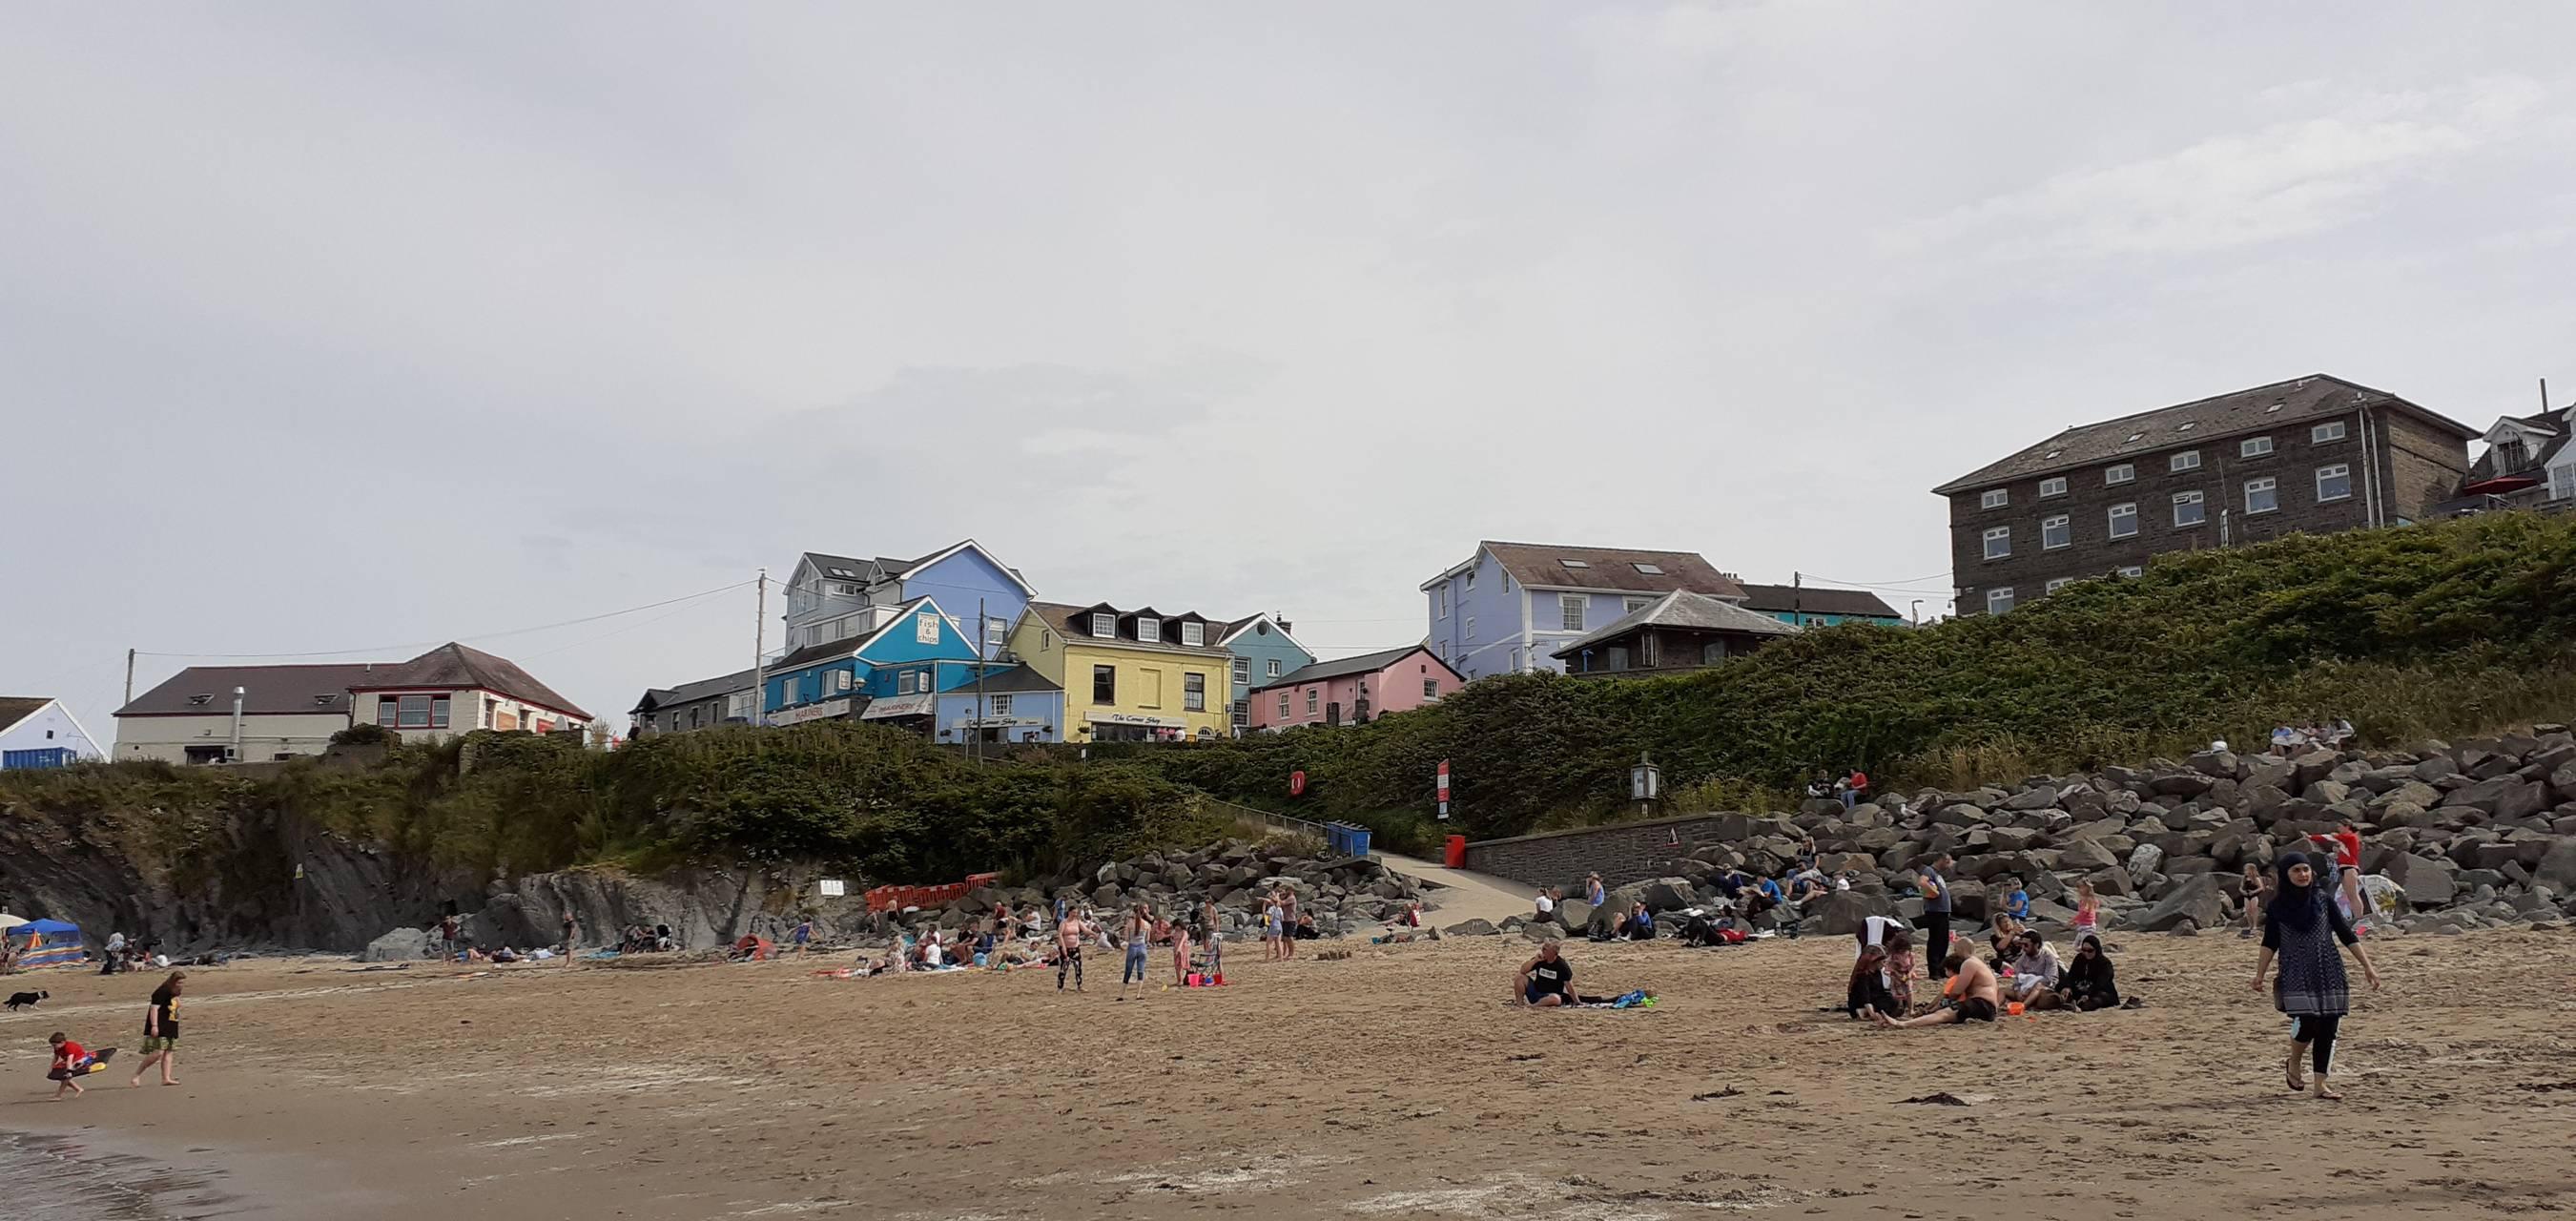 Newquay Seaside